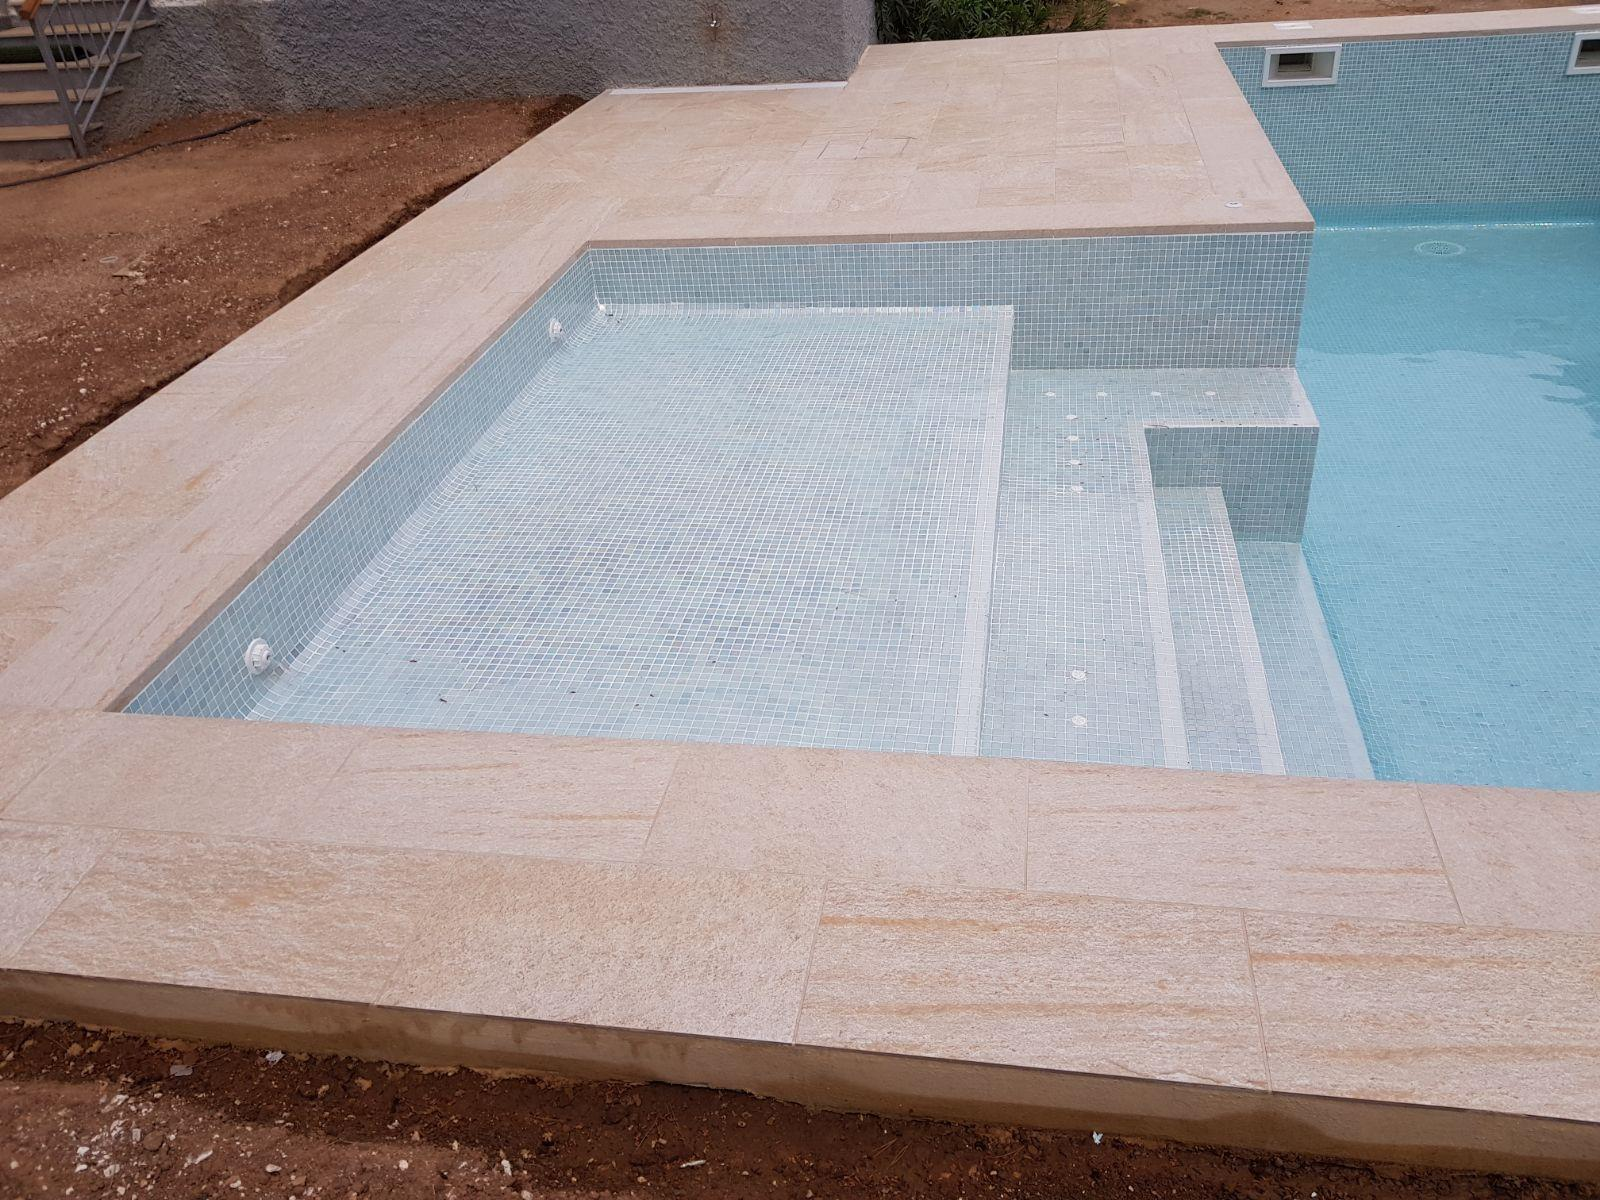 reforma_piscina_1_20